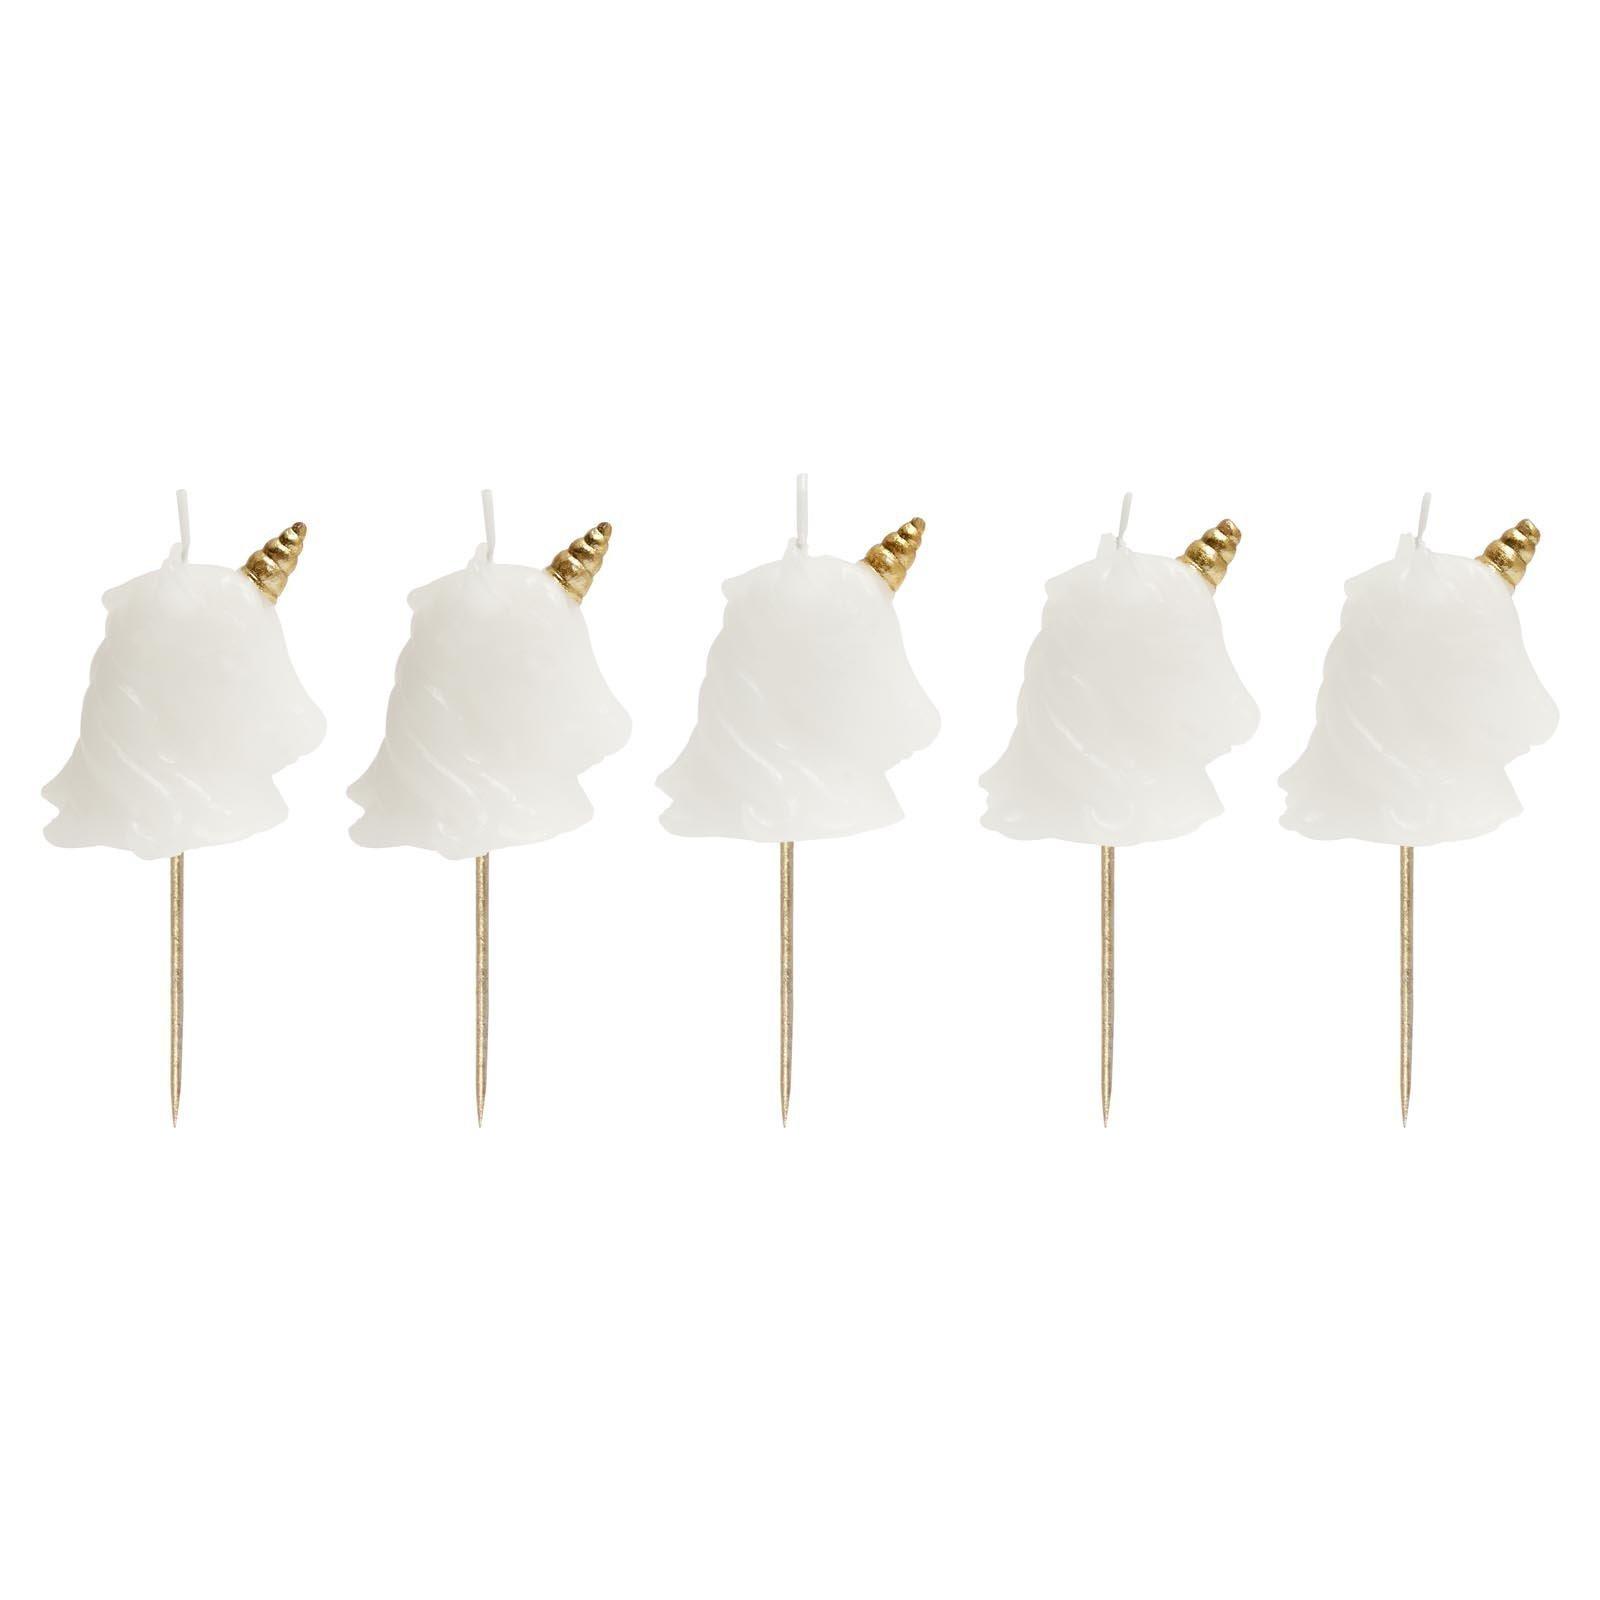 SunnyLIFE Themed Cake Candles in Animal, Plant, and Food Shapes, Set of 5 - Unicorn White